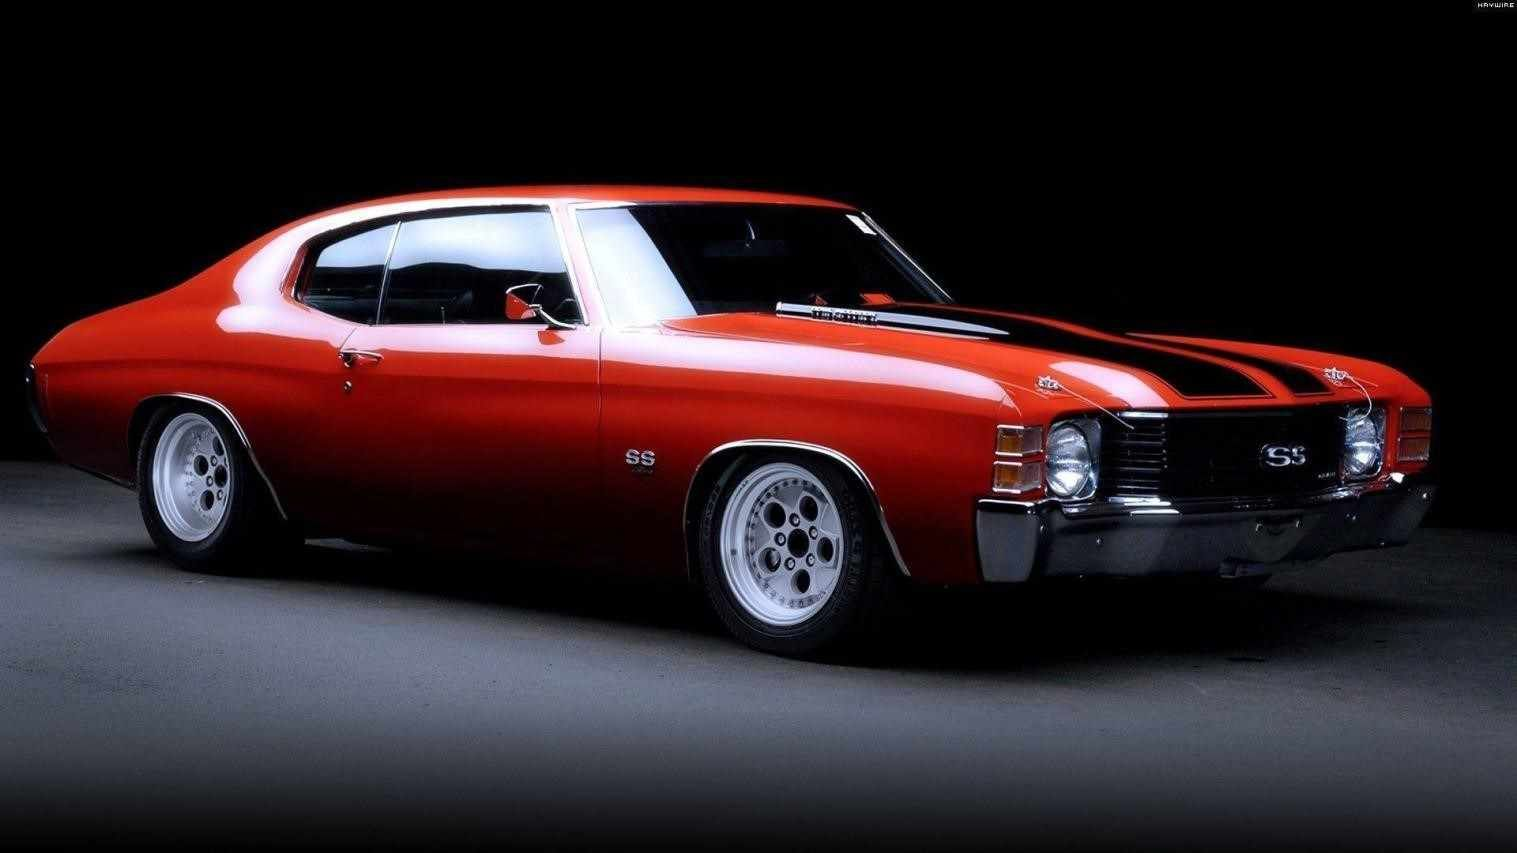 car badass Muscle Cars Chevy camaro pinterest ss car classic muscle ...